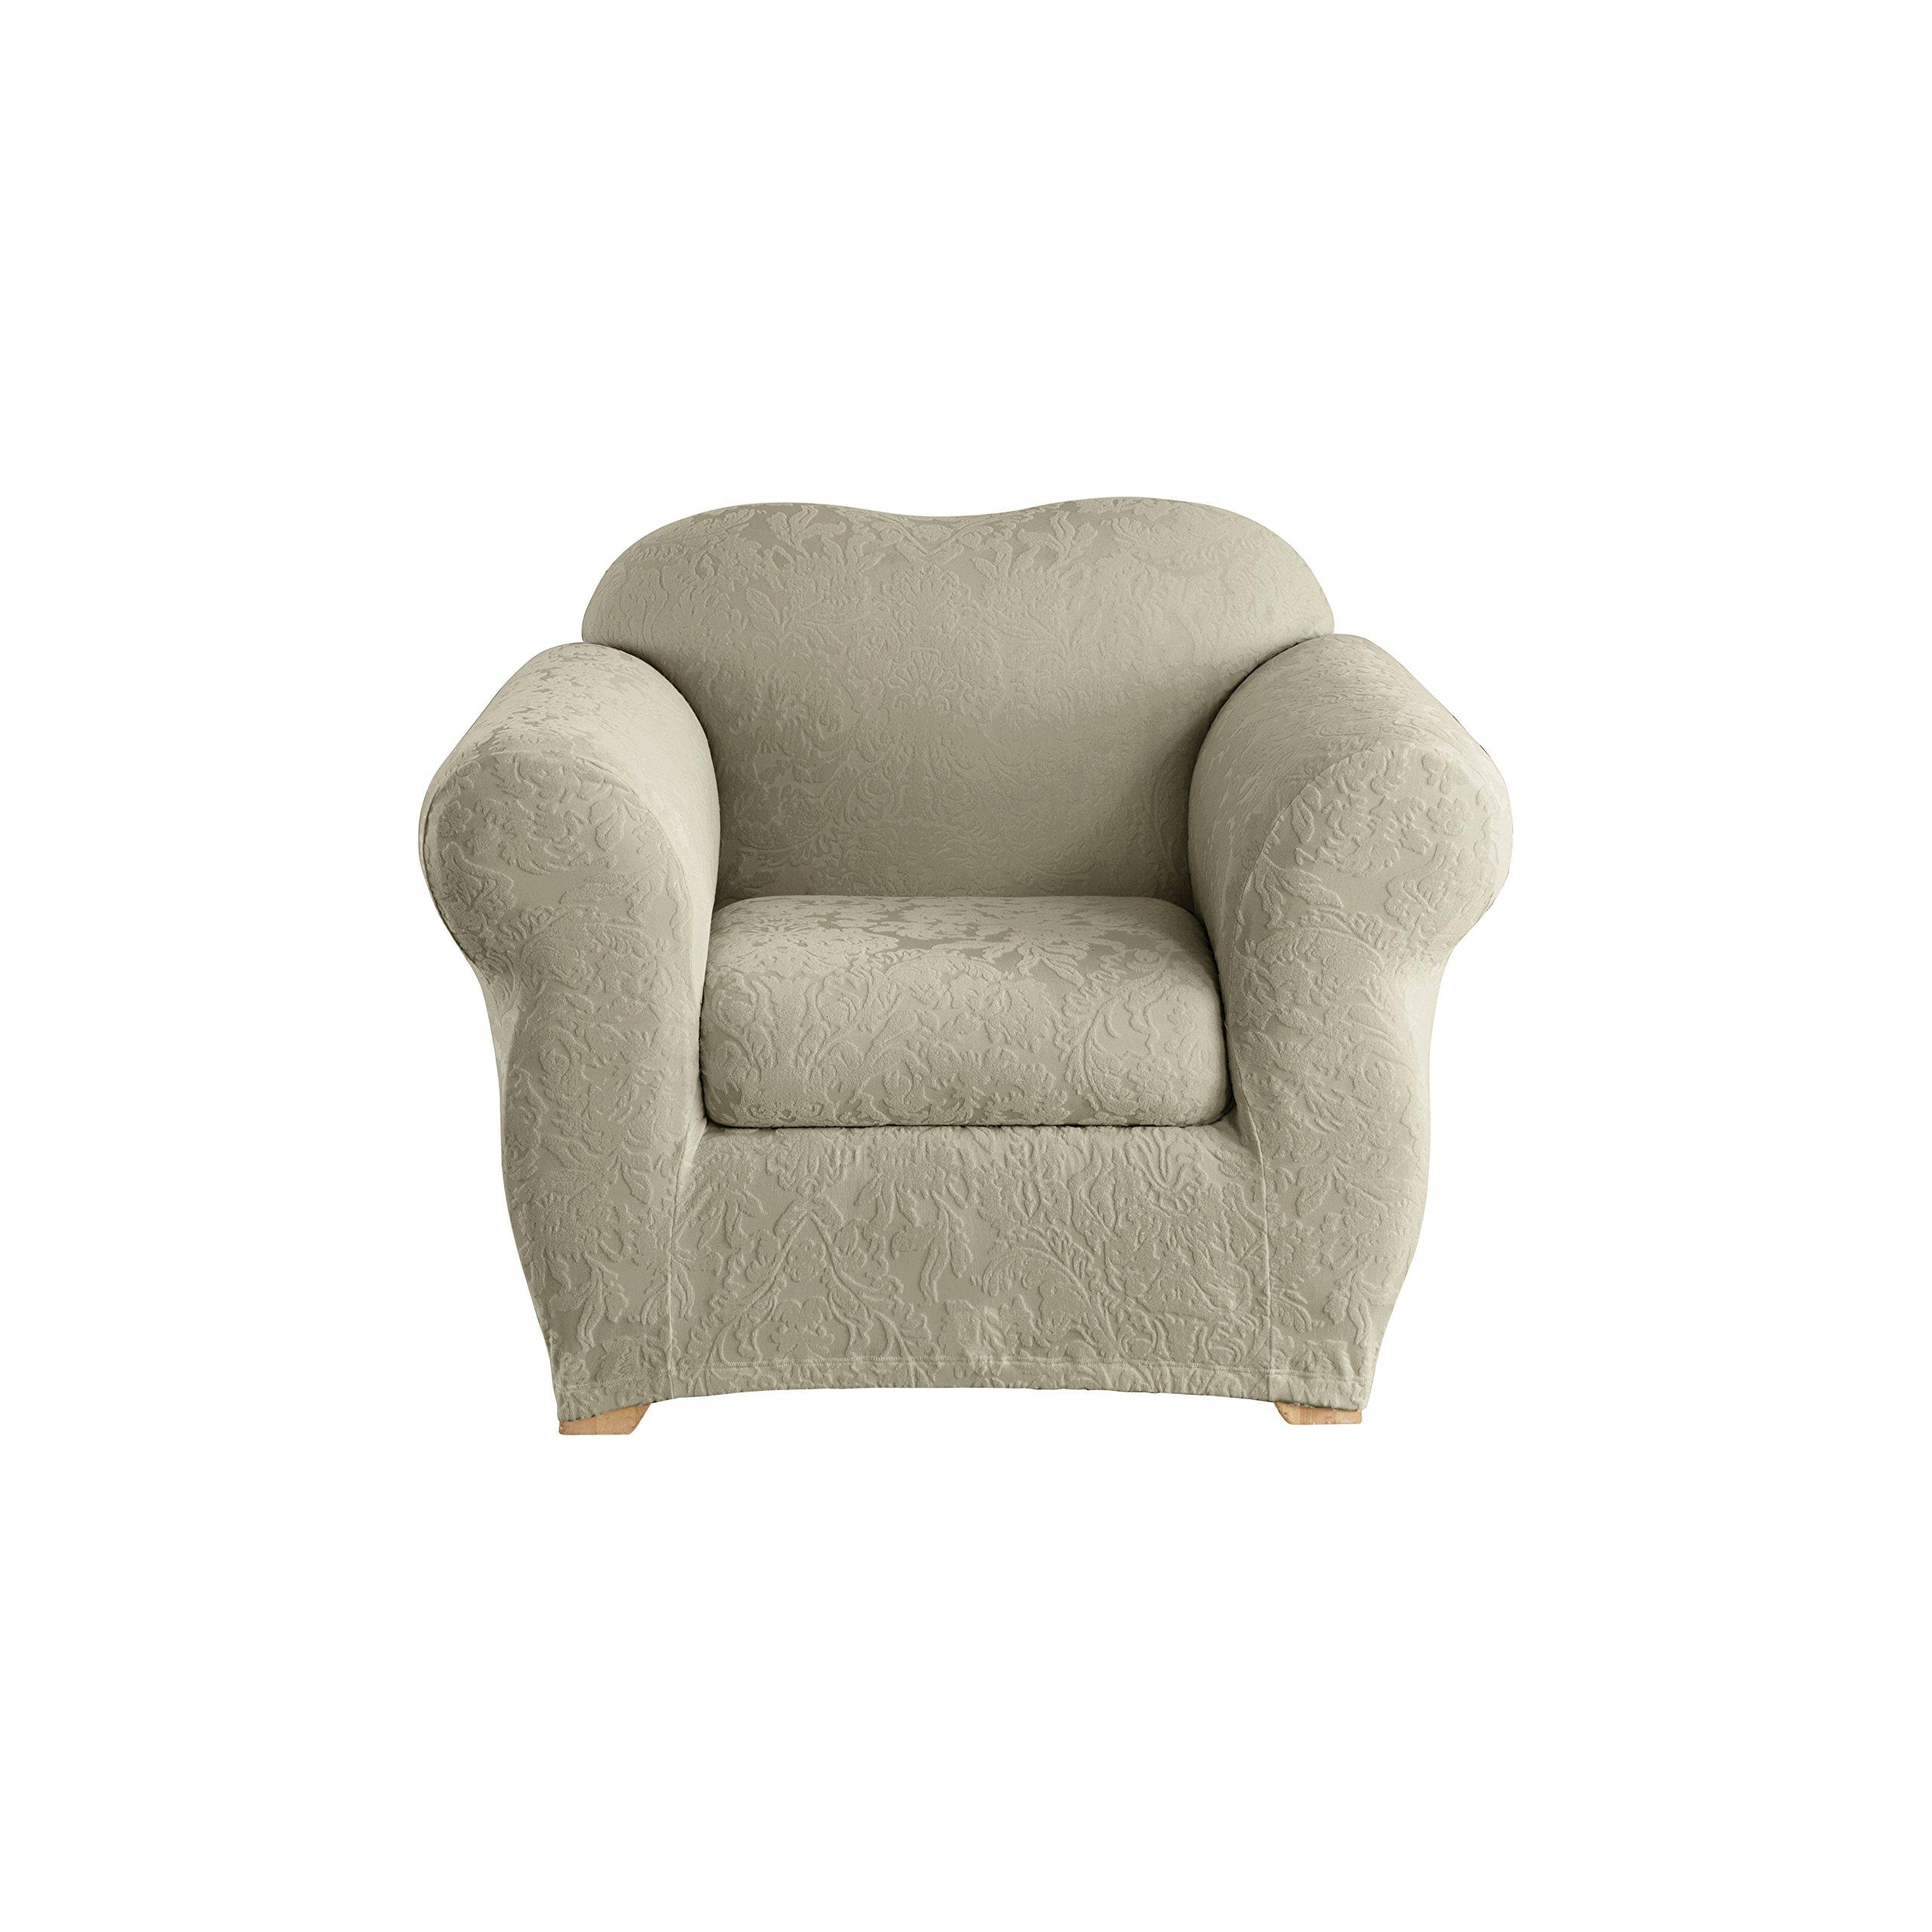 Sure Fit Stretch  Jacquard Damask 2-Piece - Chair Slipcover  - Sage (SF40164) by Surefit